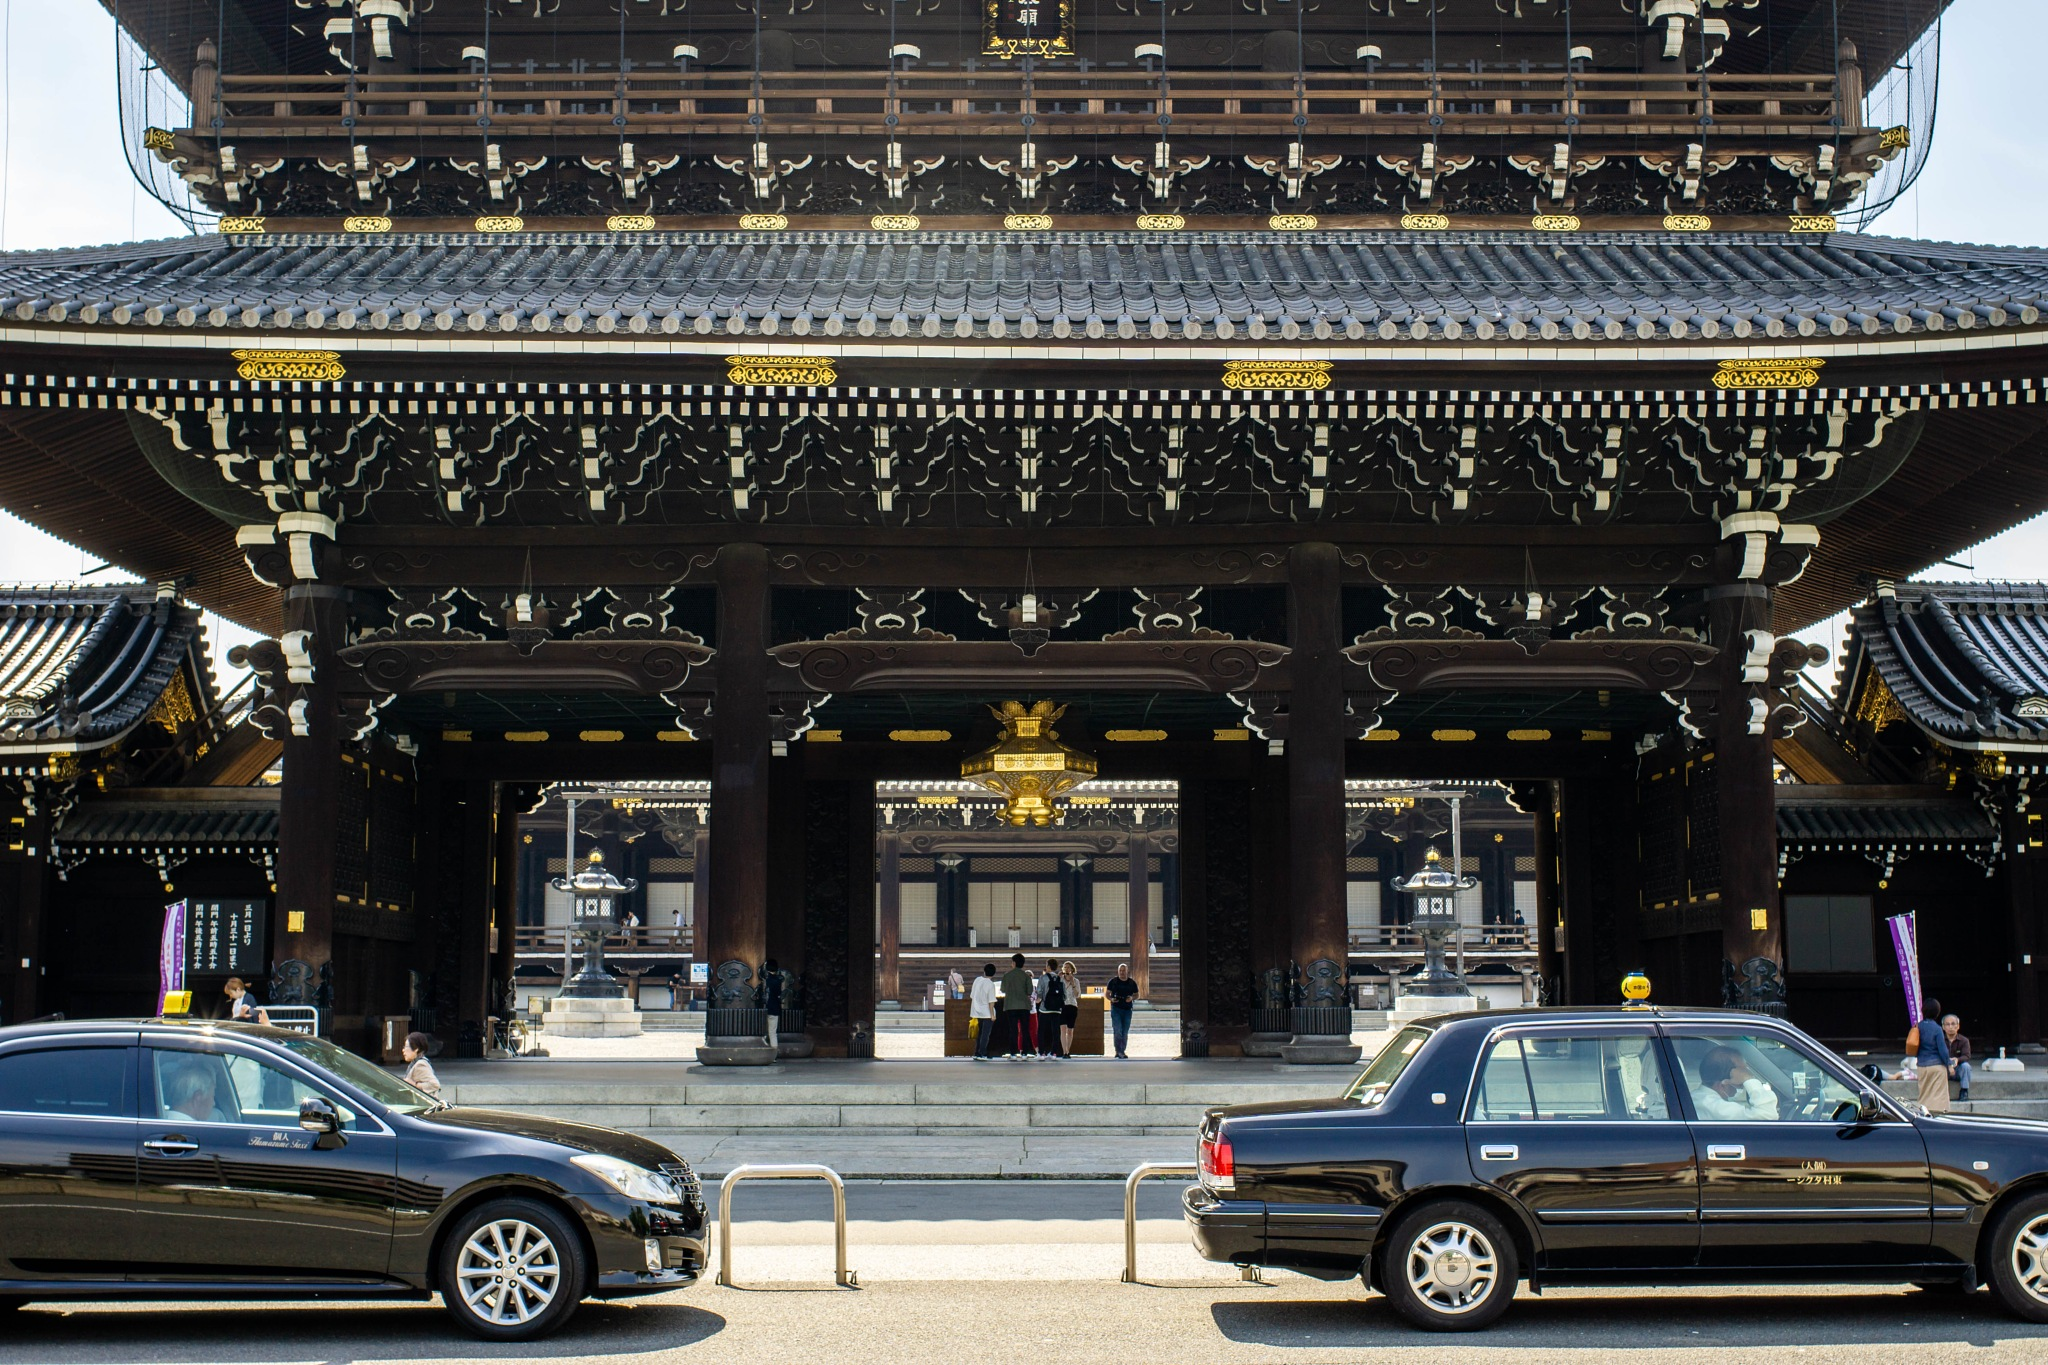 Higashi Honganji Founder's Hall Gate by Shumiku